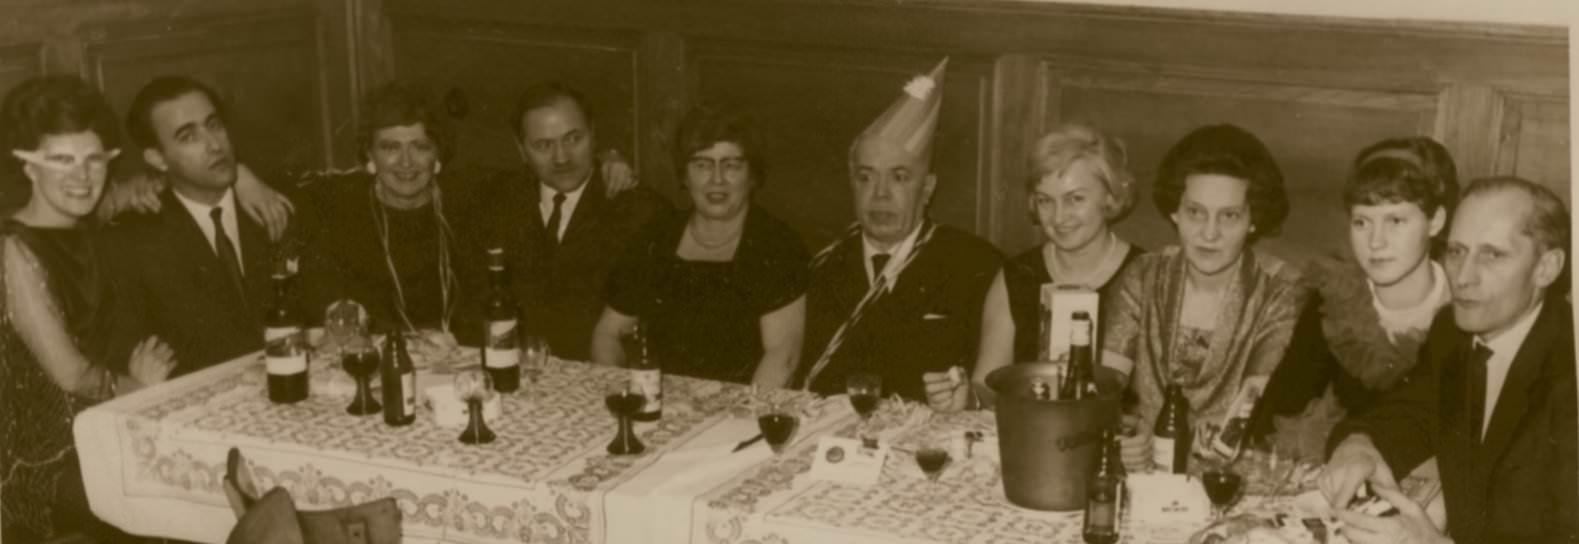 Cu  Prof. George Carsteanu  la Carnaval (1965) hp 1